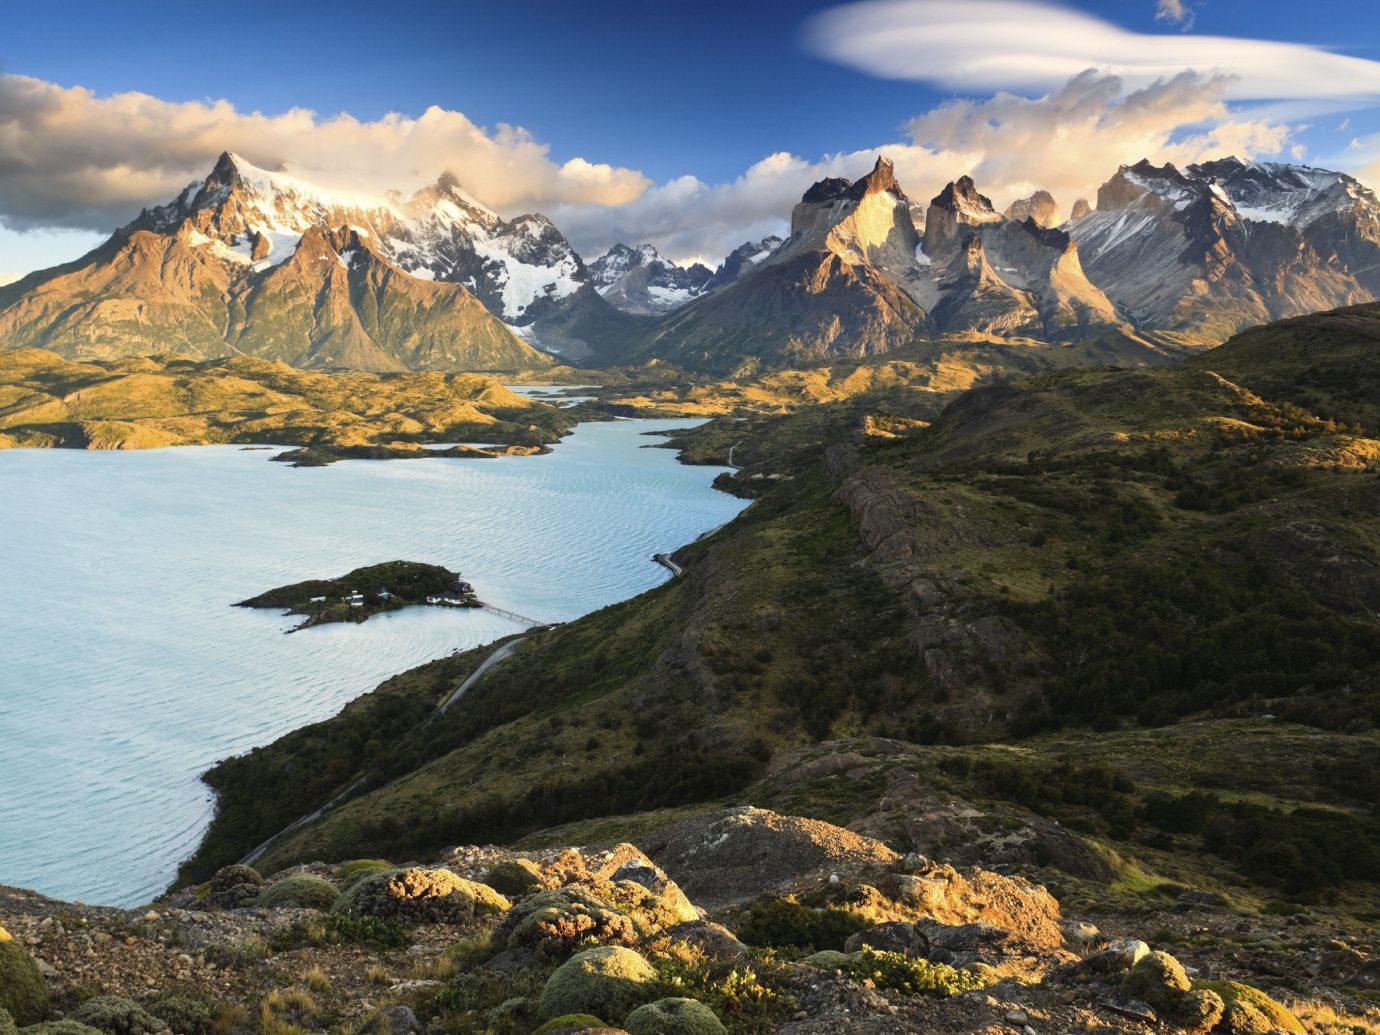 Breathtaking mountain range on the water in Patagonia